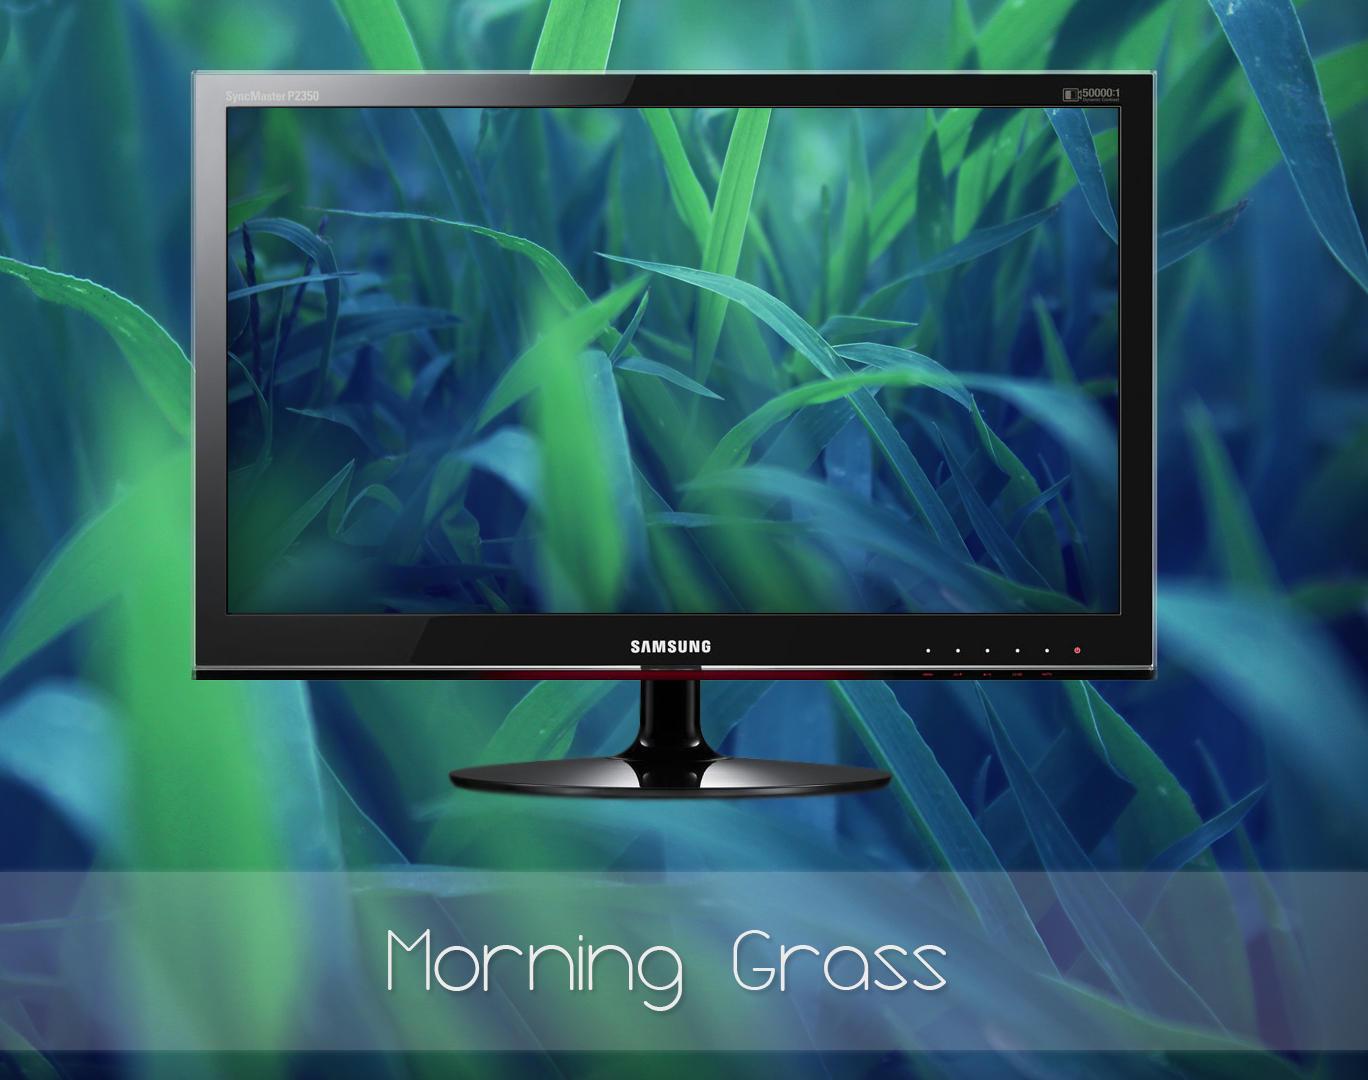 Morning Grass by MGWallpaper